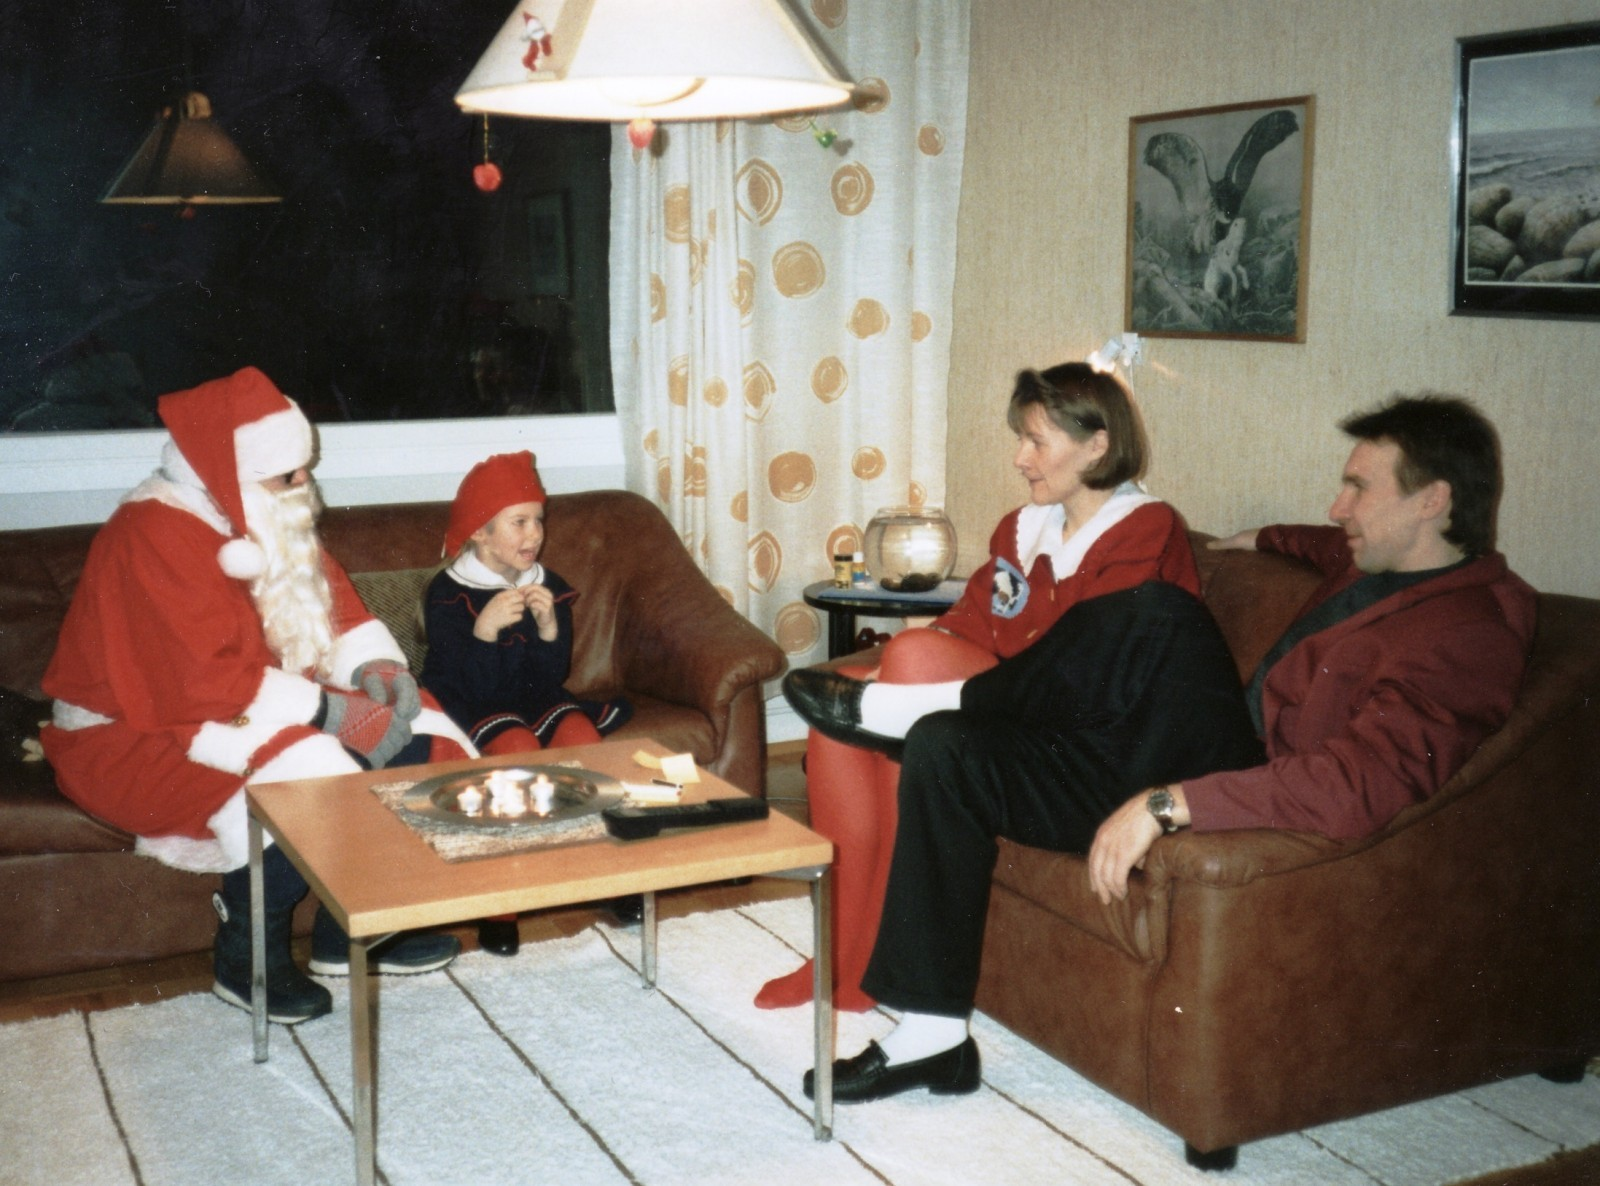 Joulu veljeni luona